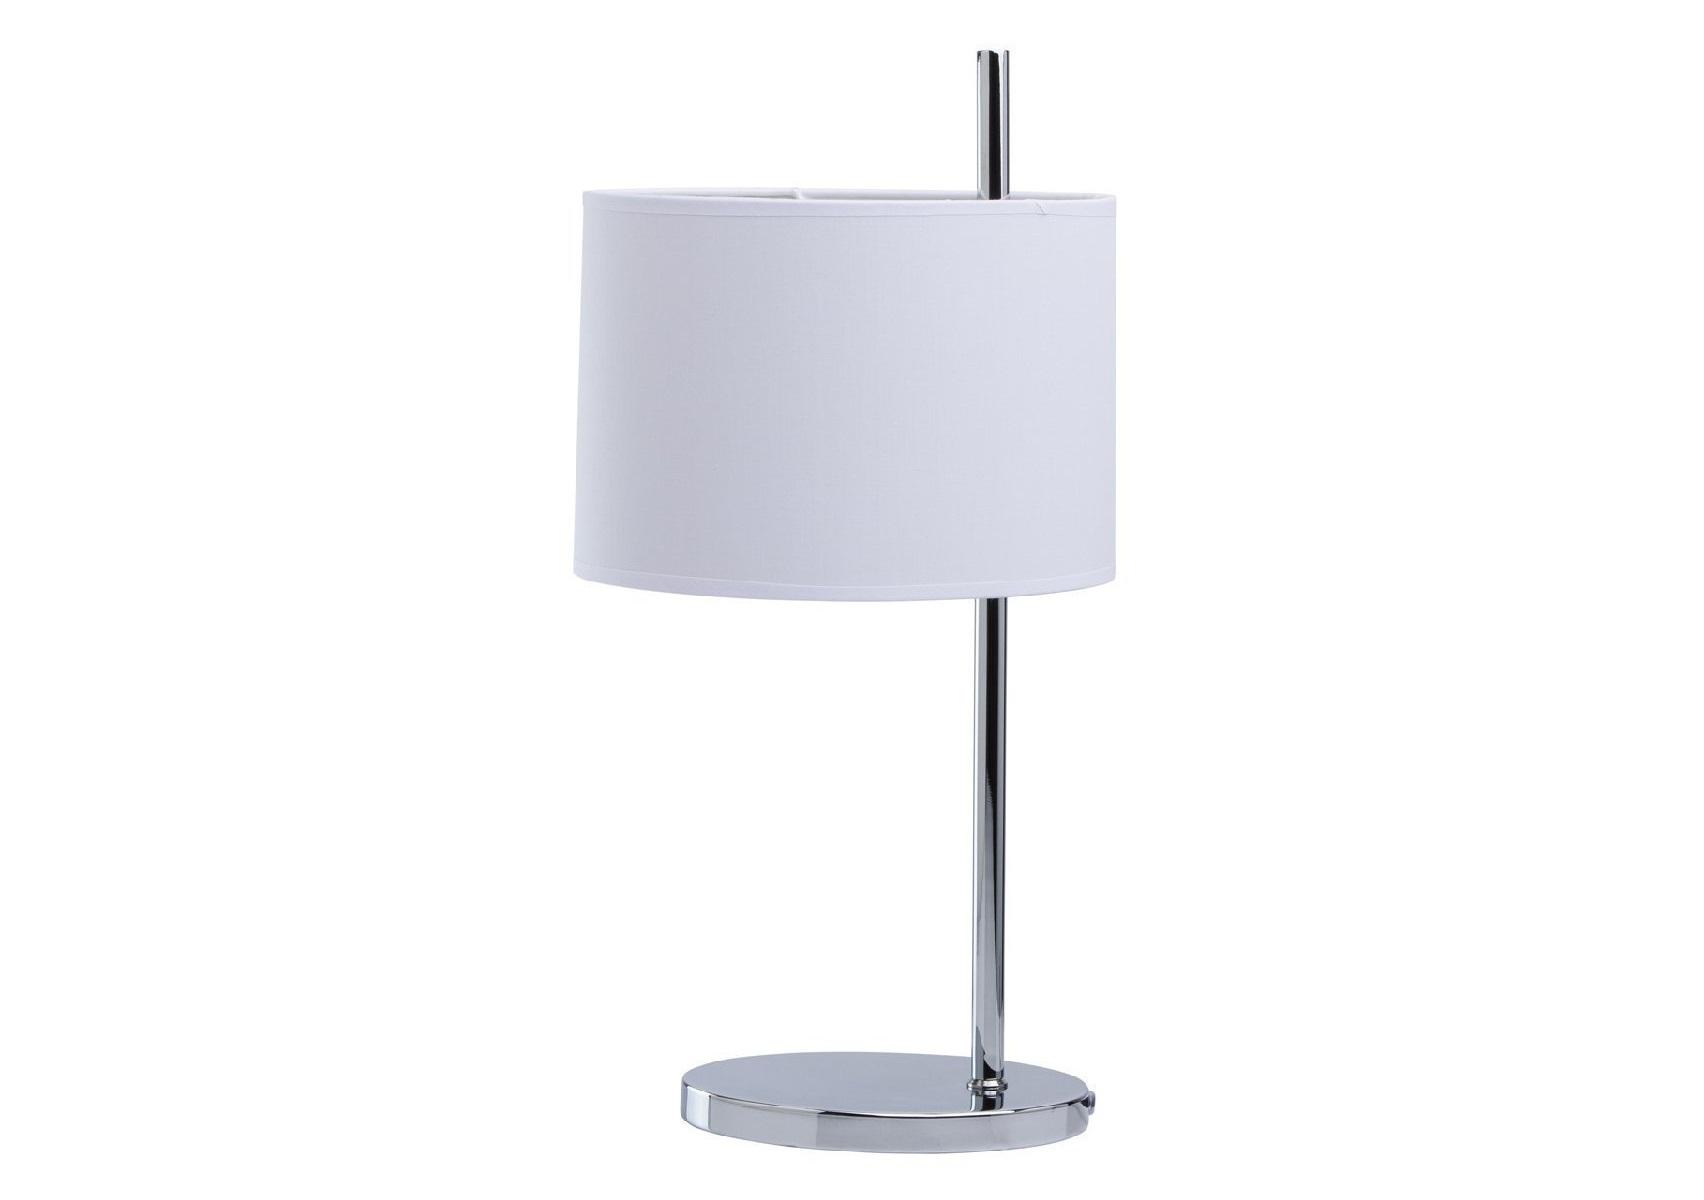 Настольная лампаДекоративные лампы<br>&amp;lt;div&amp;gt;Вид цоколя: E27&amp;lt;/div&amp;gt;&amp;lt;div&amp;gt;Мощность: 40W&amp;amp;nbsp;&amp;lt;/div&amp;gt;&amp;lt;div&amp;gt;Количество ламп: 1&amp;lt;/div&amp;gt;<br><br>Material: Металл<br>Ширина см: 22<br>Высота см: 56<br>Глубина см: 26